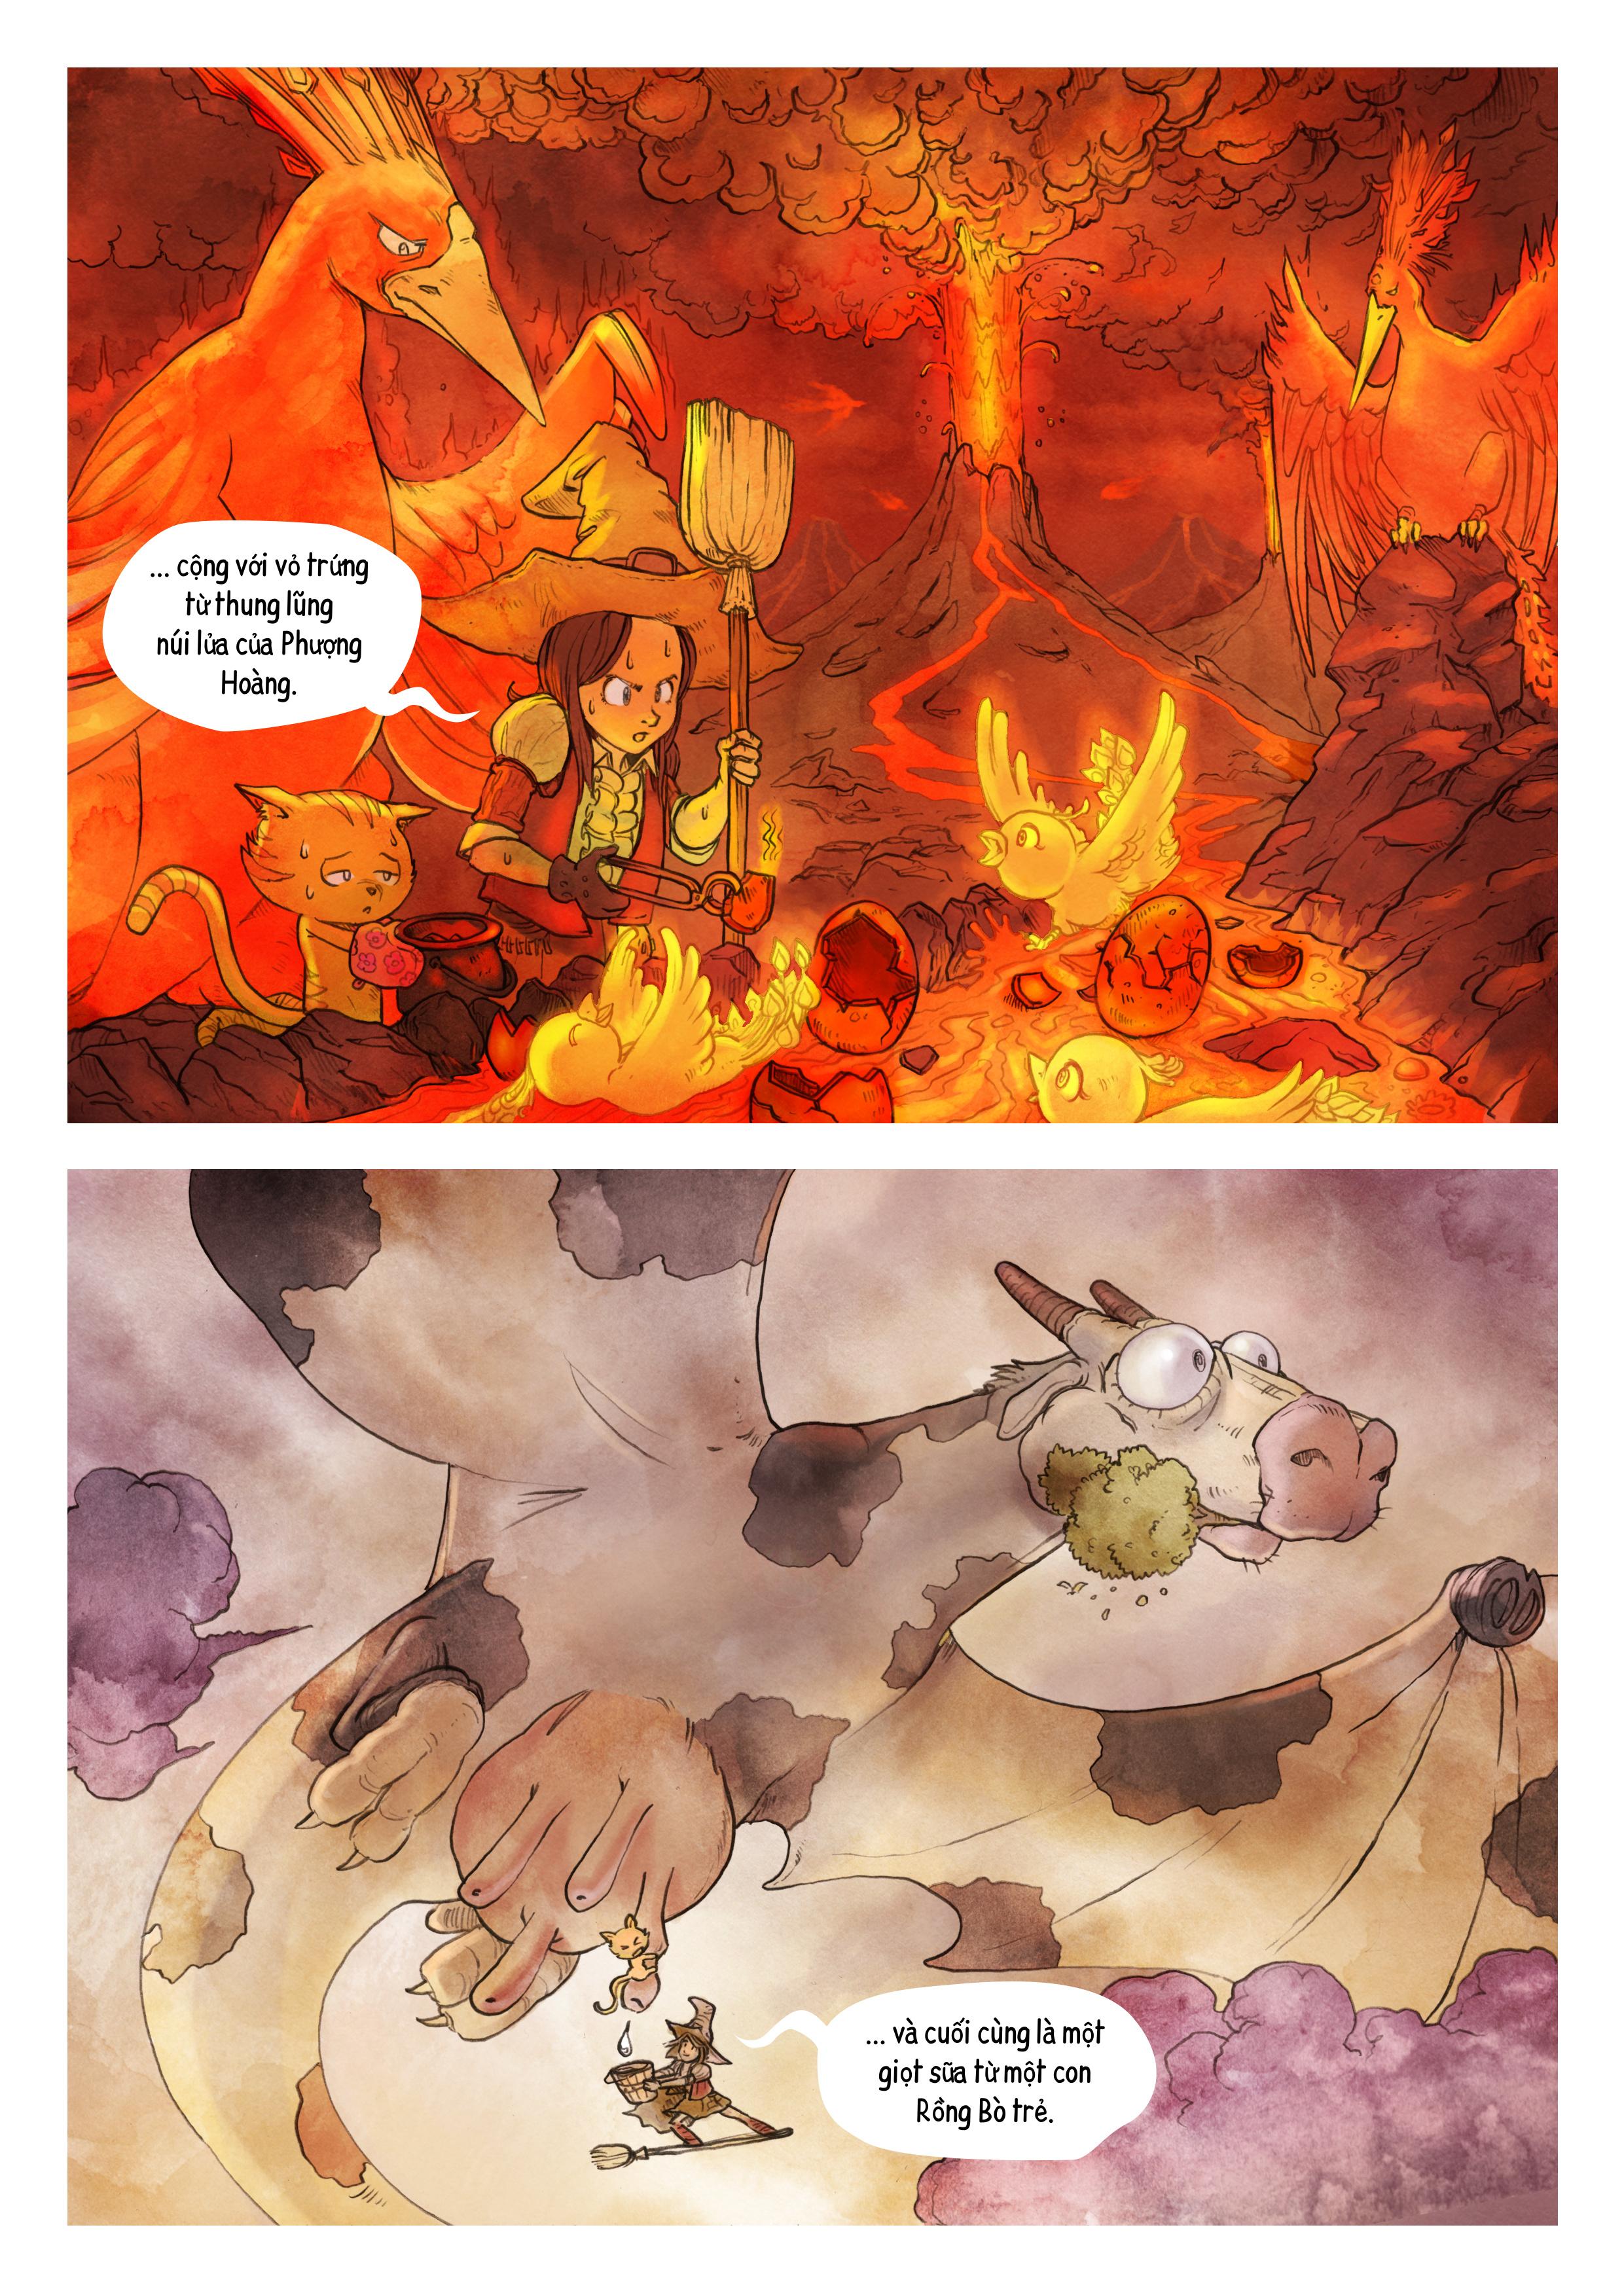 A webcomic page of Pepper&Carrot, Tập 3 [vi], trang 6